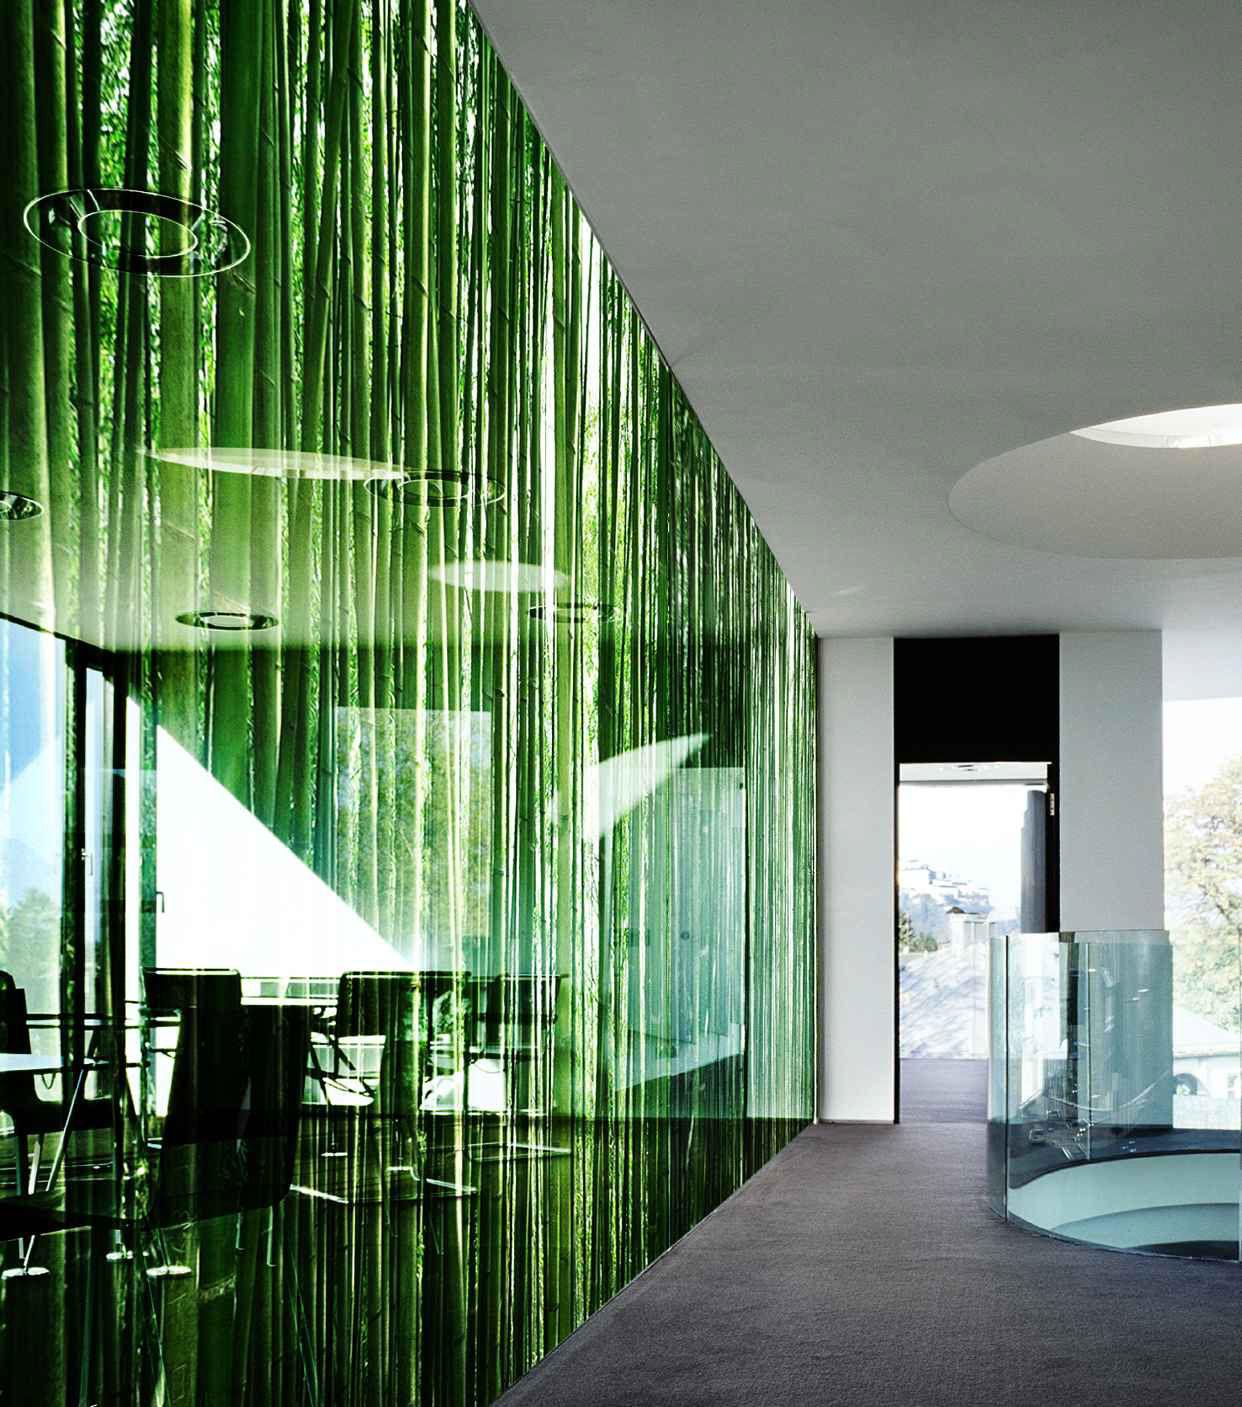 panel-vidrio-decorativo-impresion-digitalizada-67763-2983301